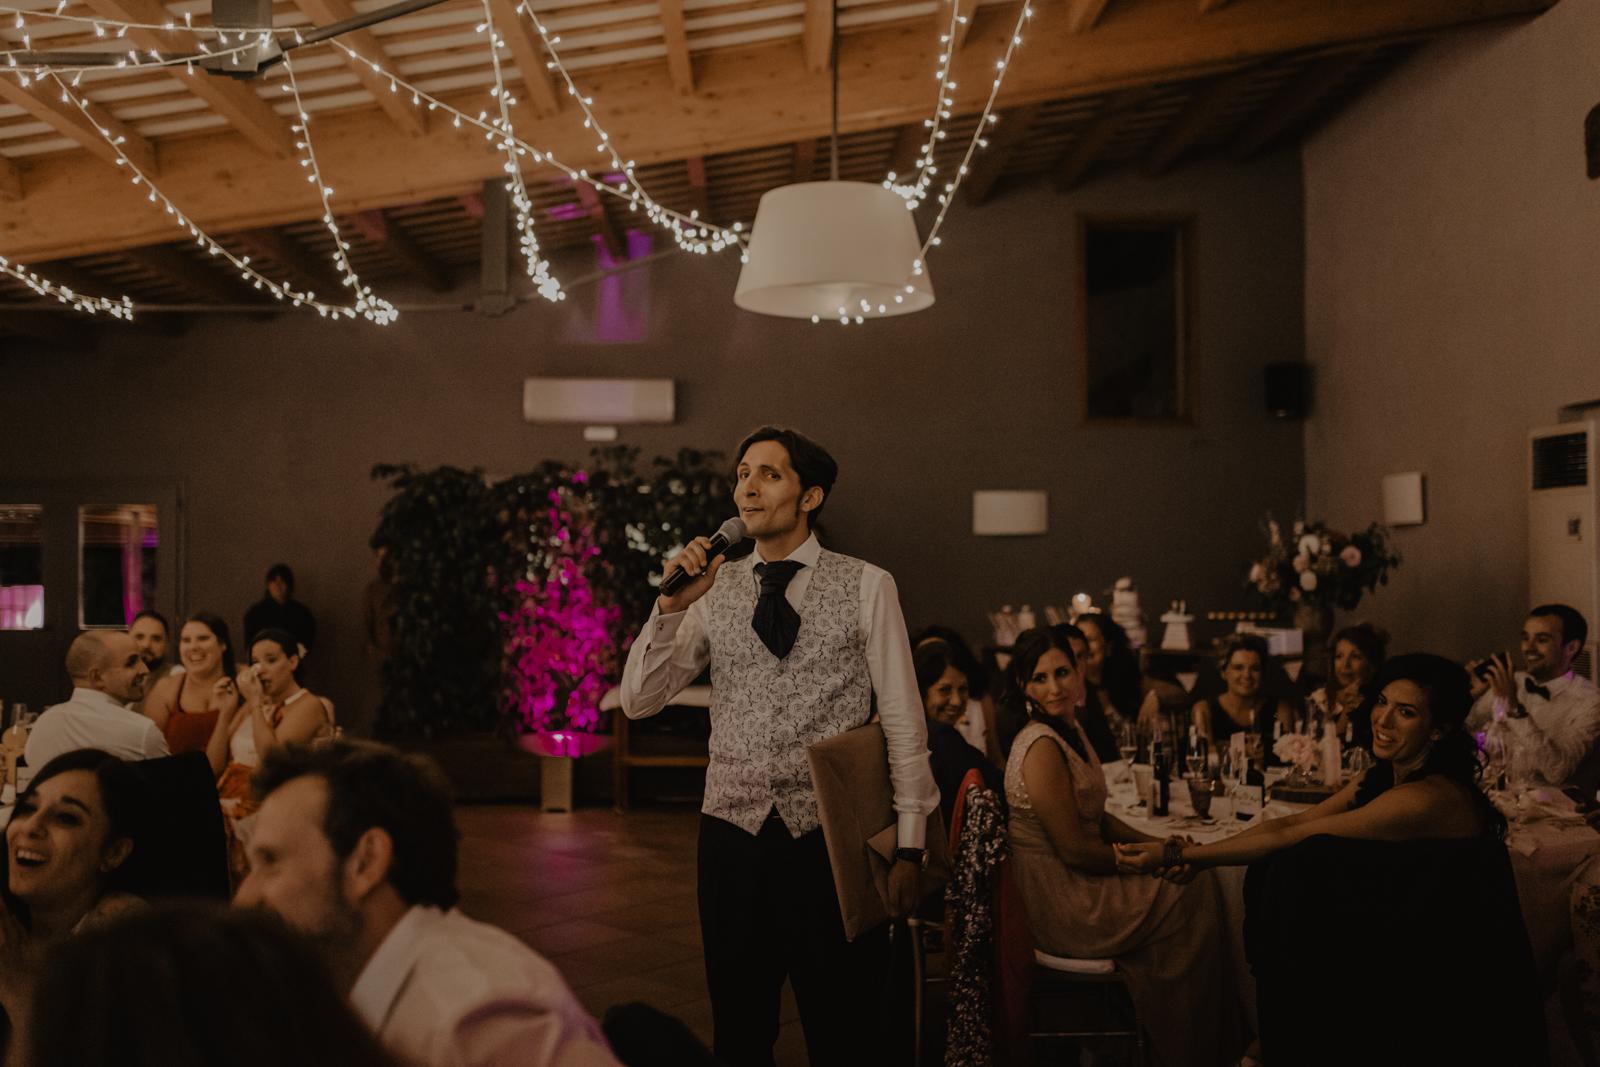 thenortherngirlphotography_photography_thenortherngirl_rebeccascabros_wedding_weddingphotography_weddingphotographer_barcelona_bodaenbarcelona_bodaenmaselmarti_bodarogeryvane-918.jpg